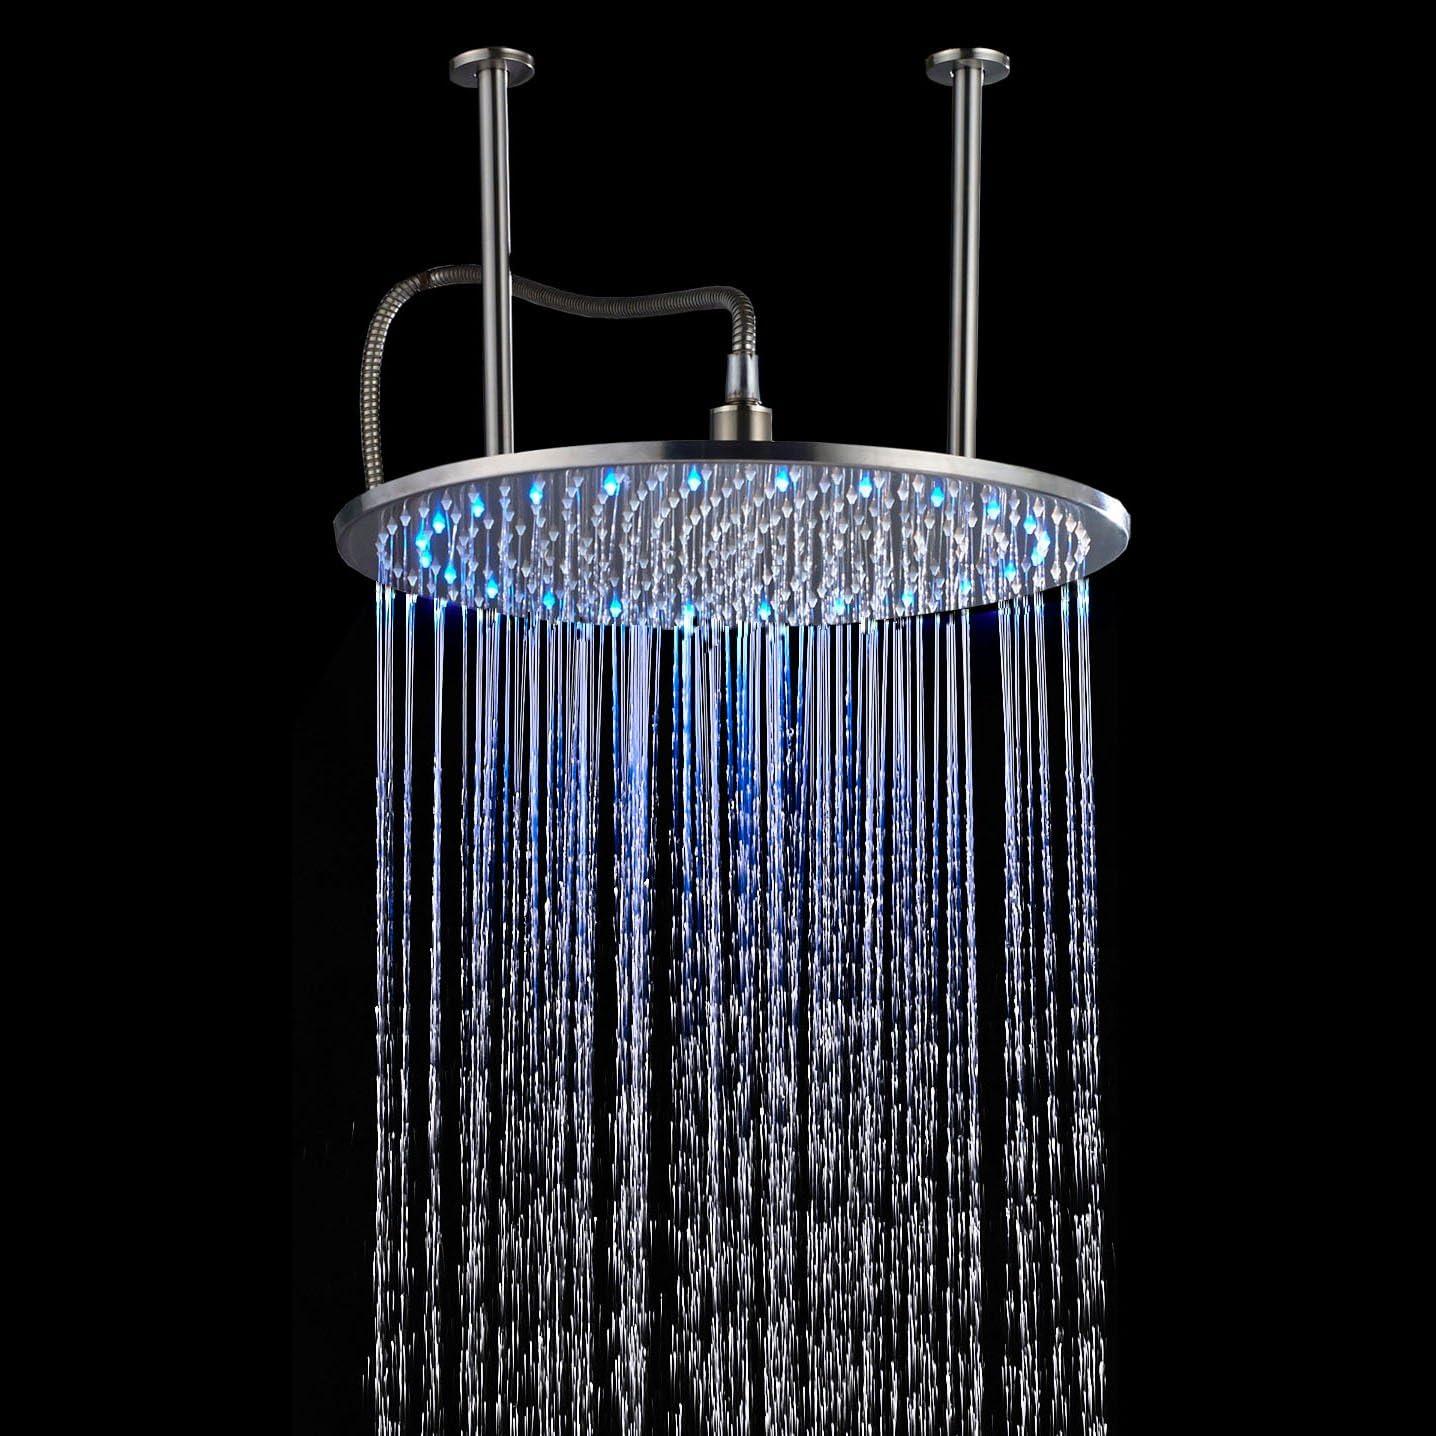 24 inch Rainfall Bathroom Brass Square Ceiling Mounted Top Shower Sprayer Head